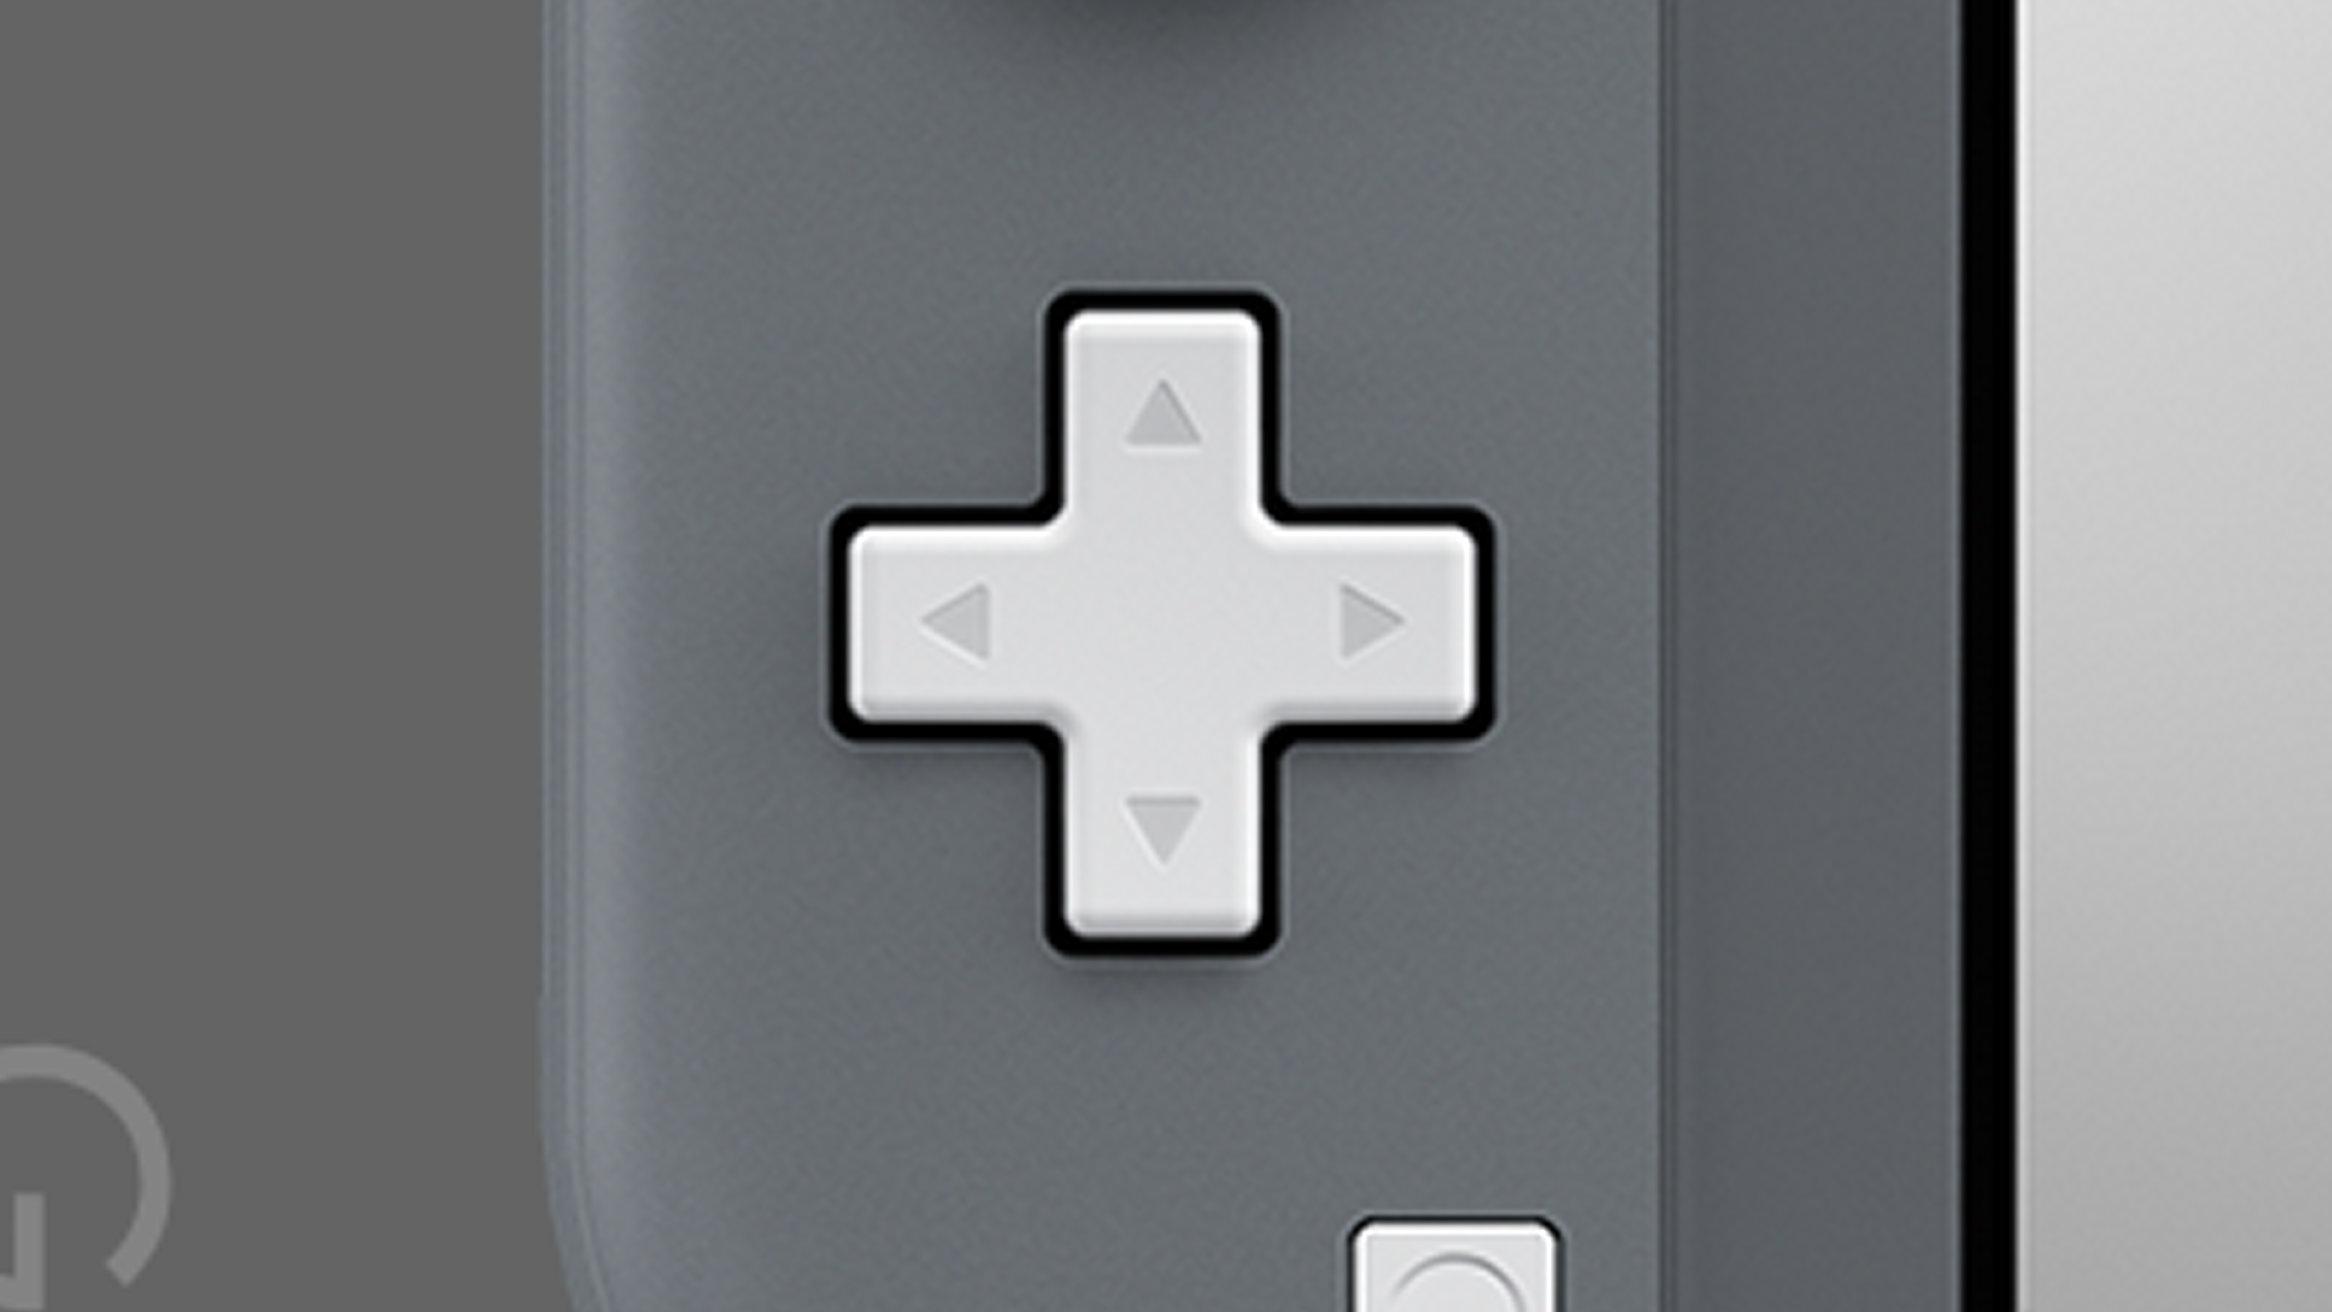 Nintendo Switch Lite、十字キーの斜め入力がしにくい